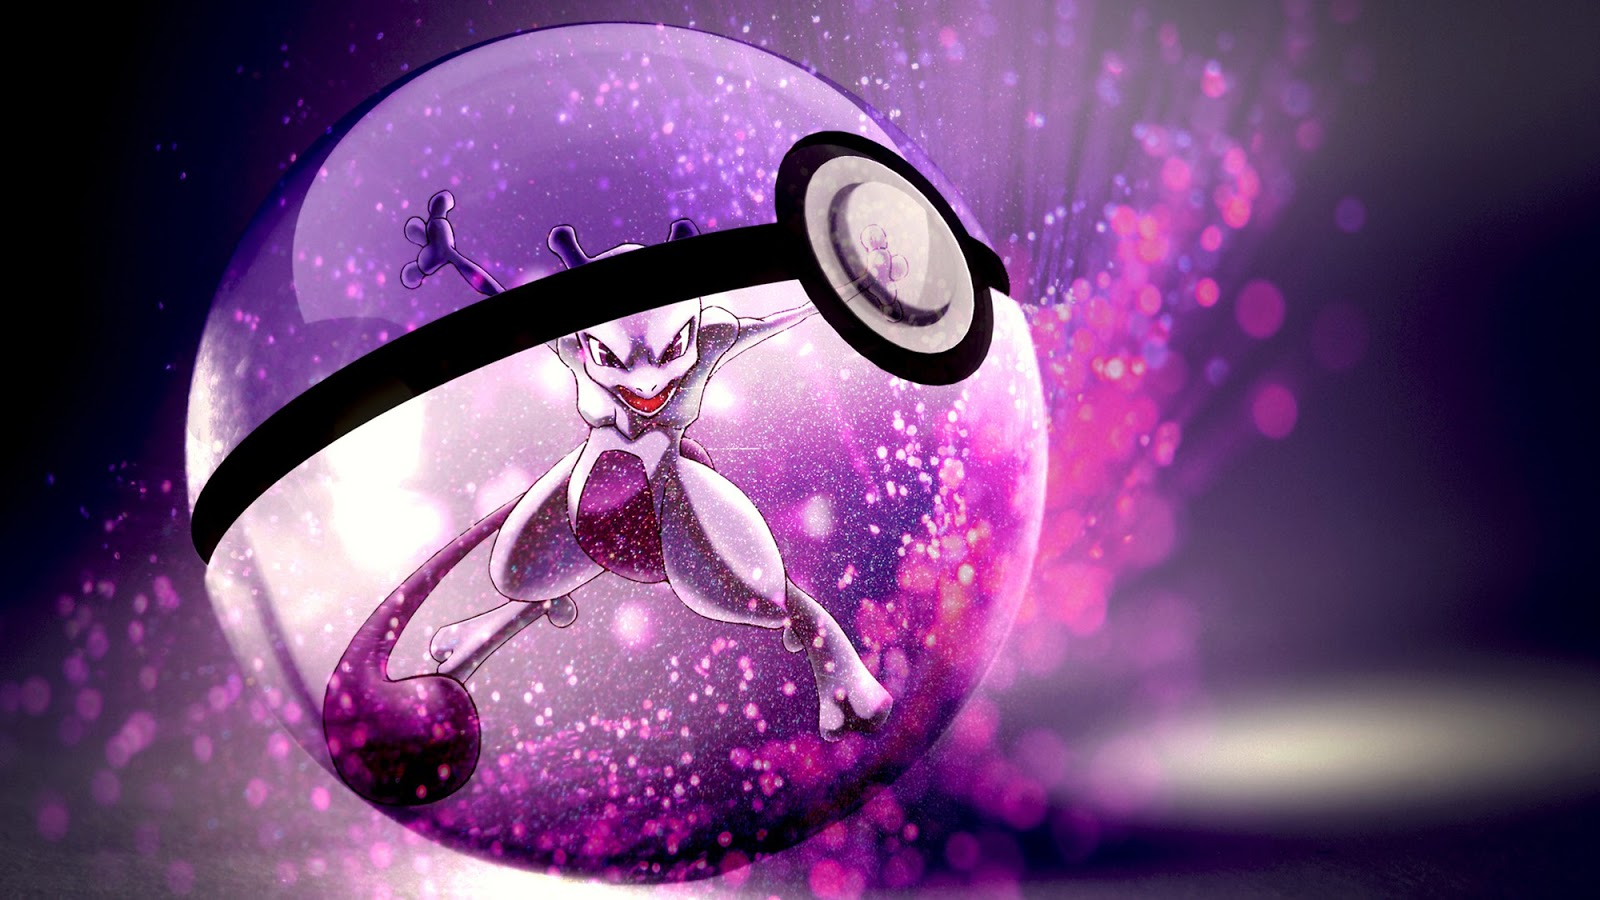 Pokemon Mewtwo Pokeball Anime HD Wallpaper Desktop Background 1600x900